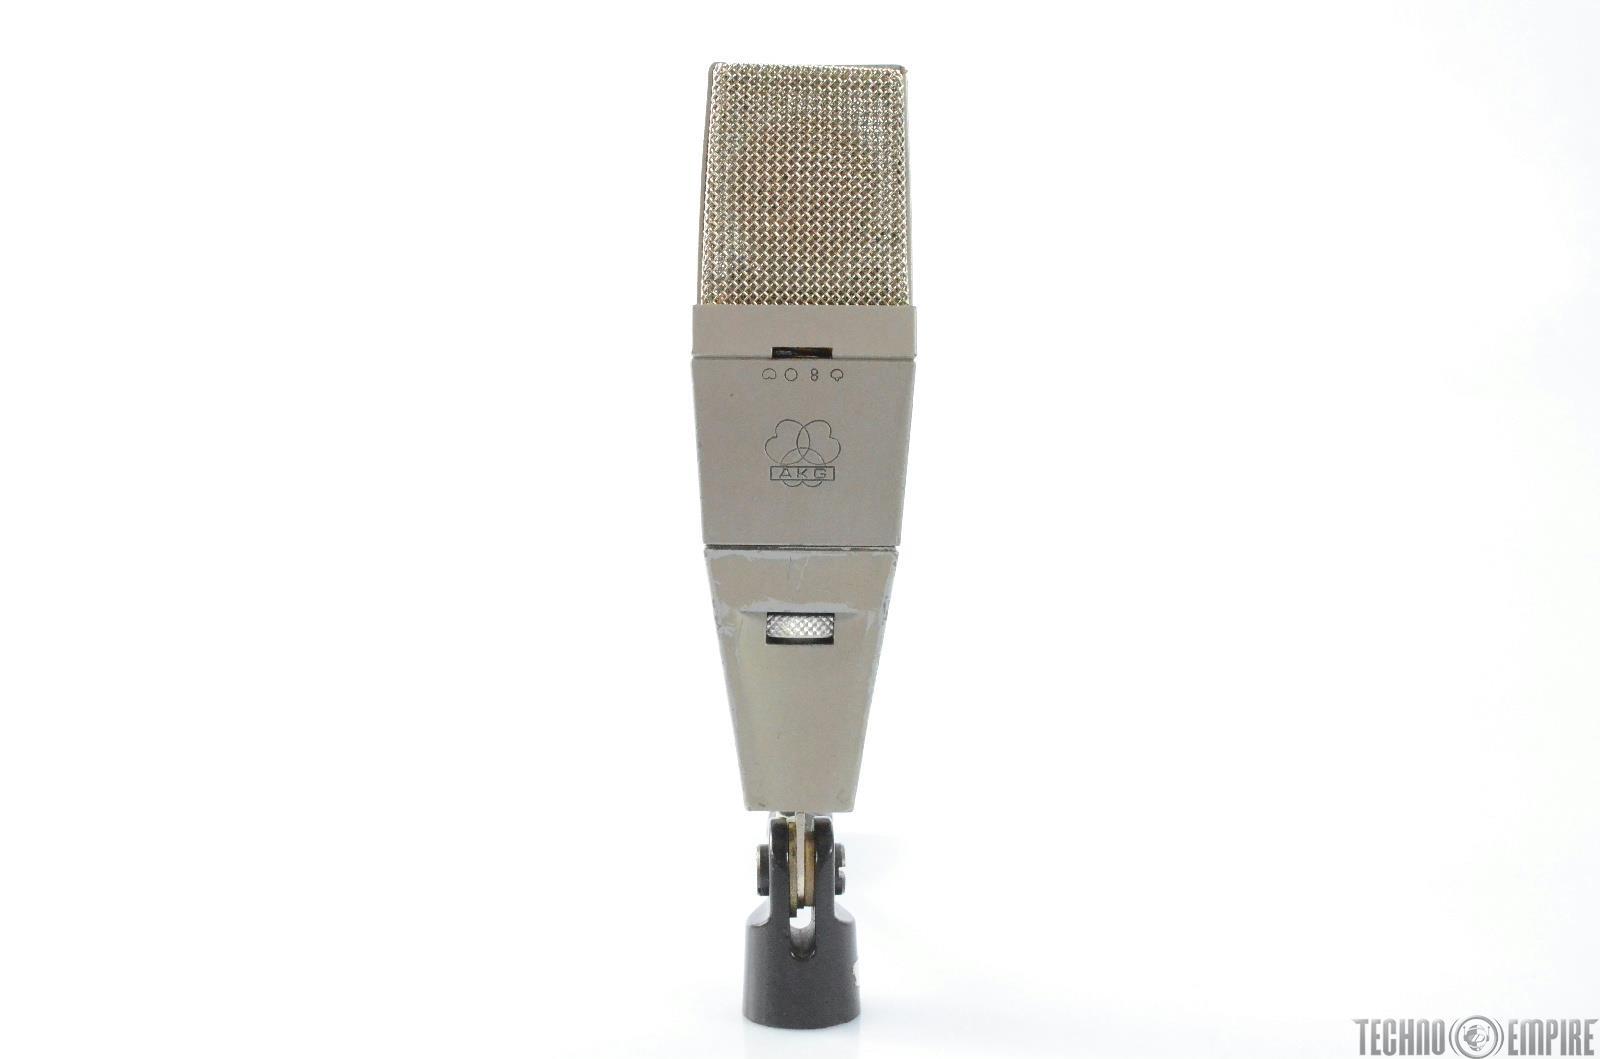 Vintage AKG C 414 Condenser Microphone Studio Mic Grandmaster Recorders #28760